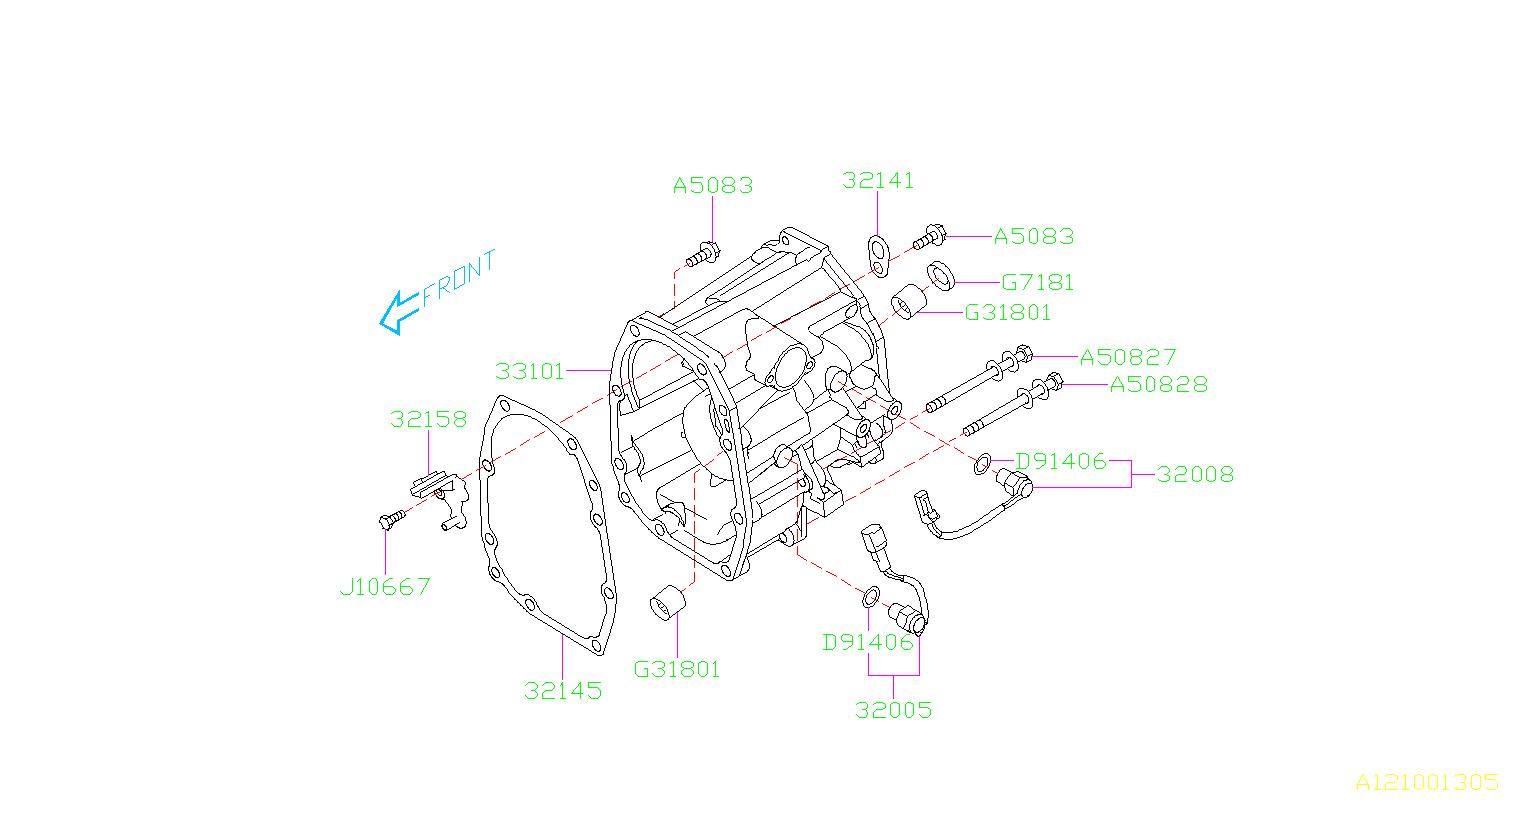 2017 Subaru Crosstrek Guide Oil Case   Rear   Transfer  Extension  Transmission  Tranfer  Manual